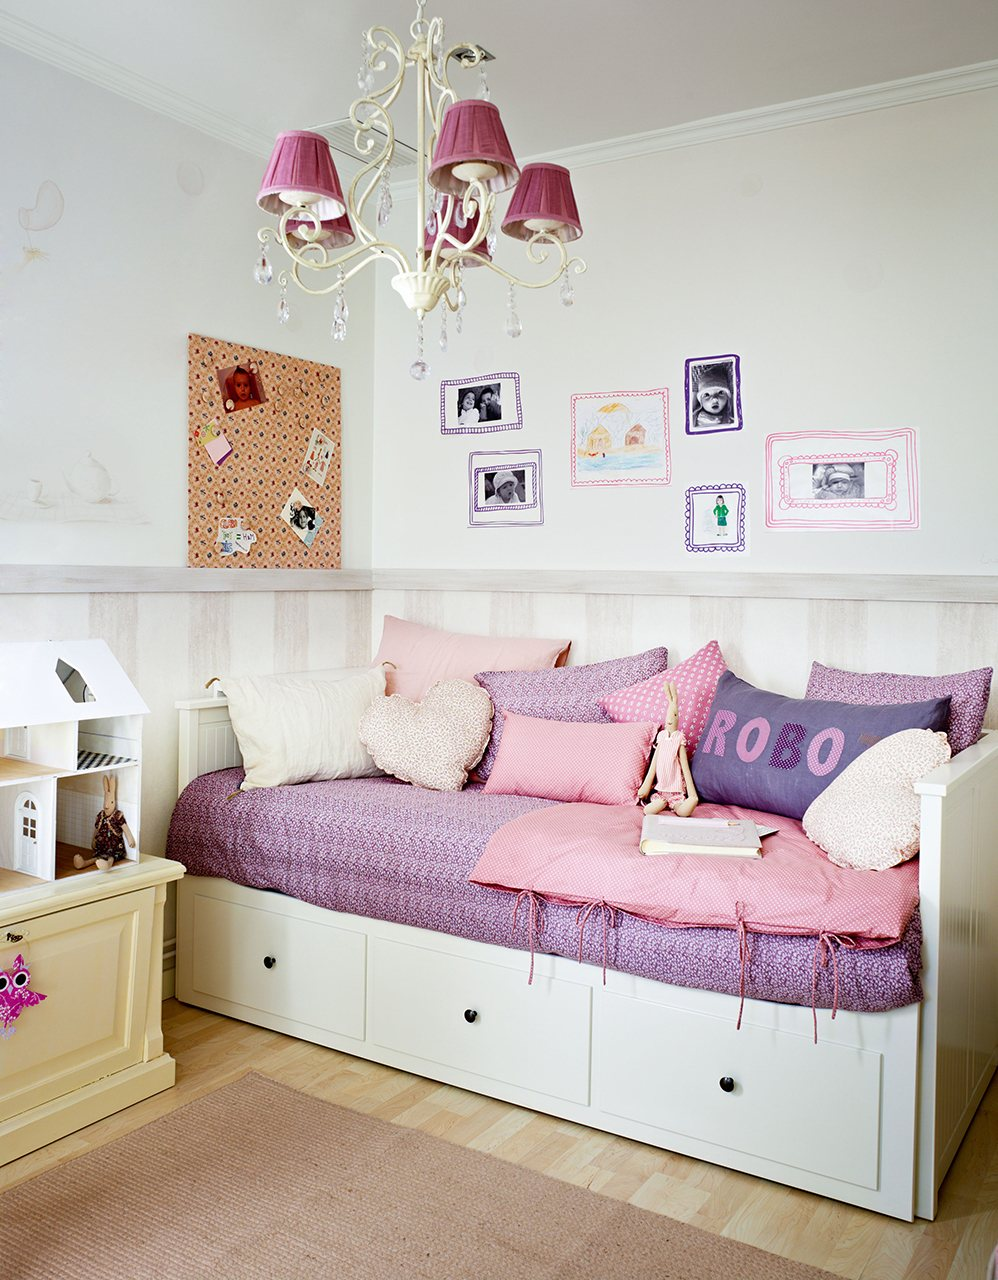 Solo cama tus gustos tu hogar for Dormitorio juvenil nina